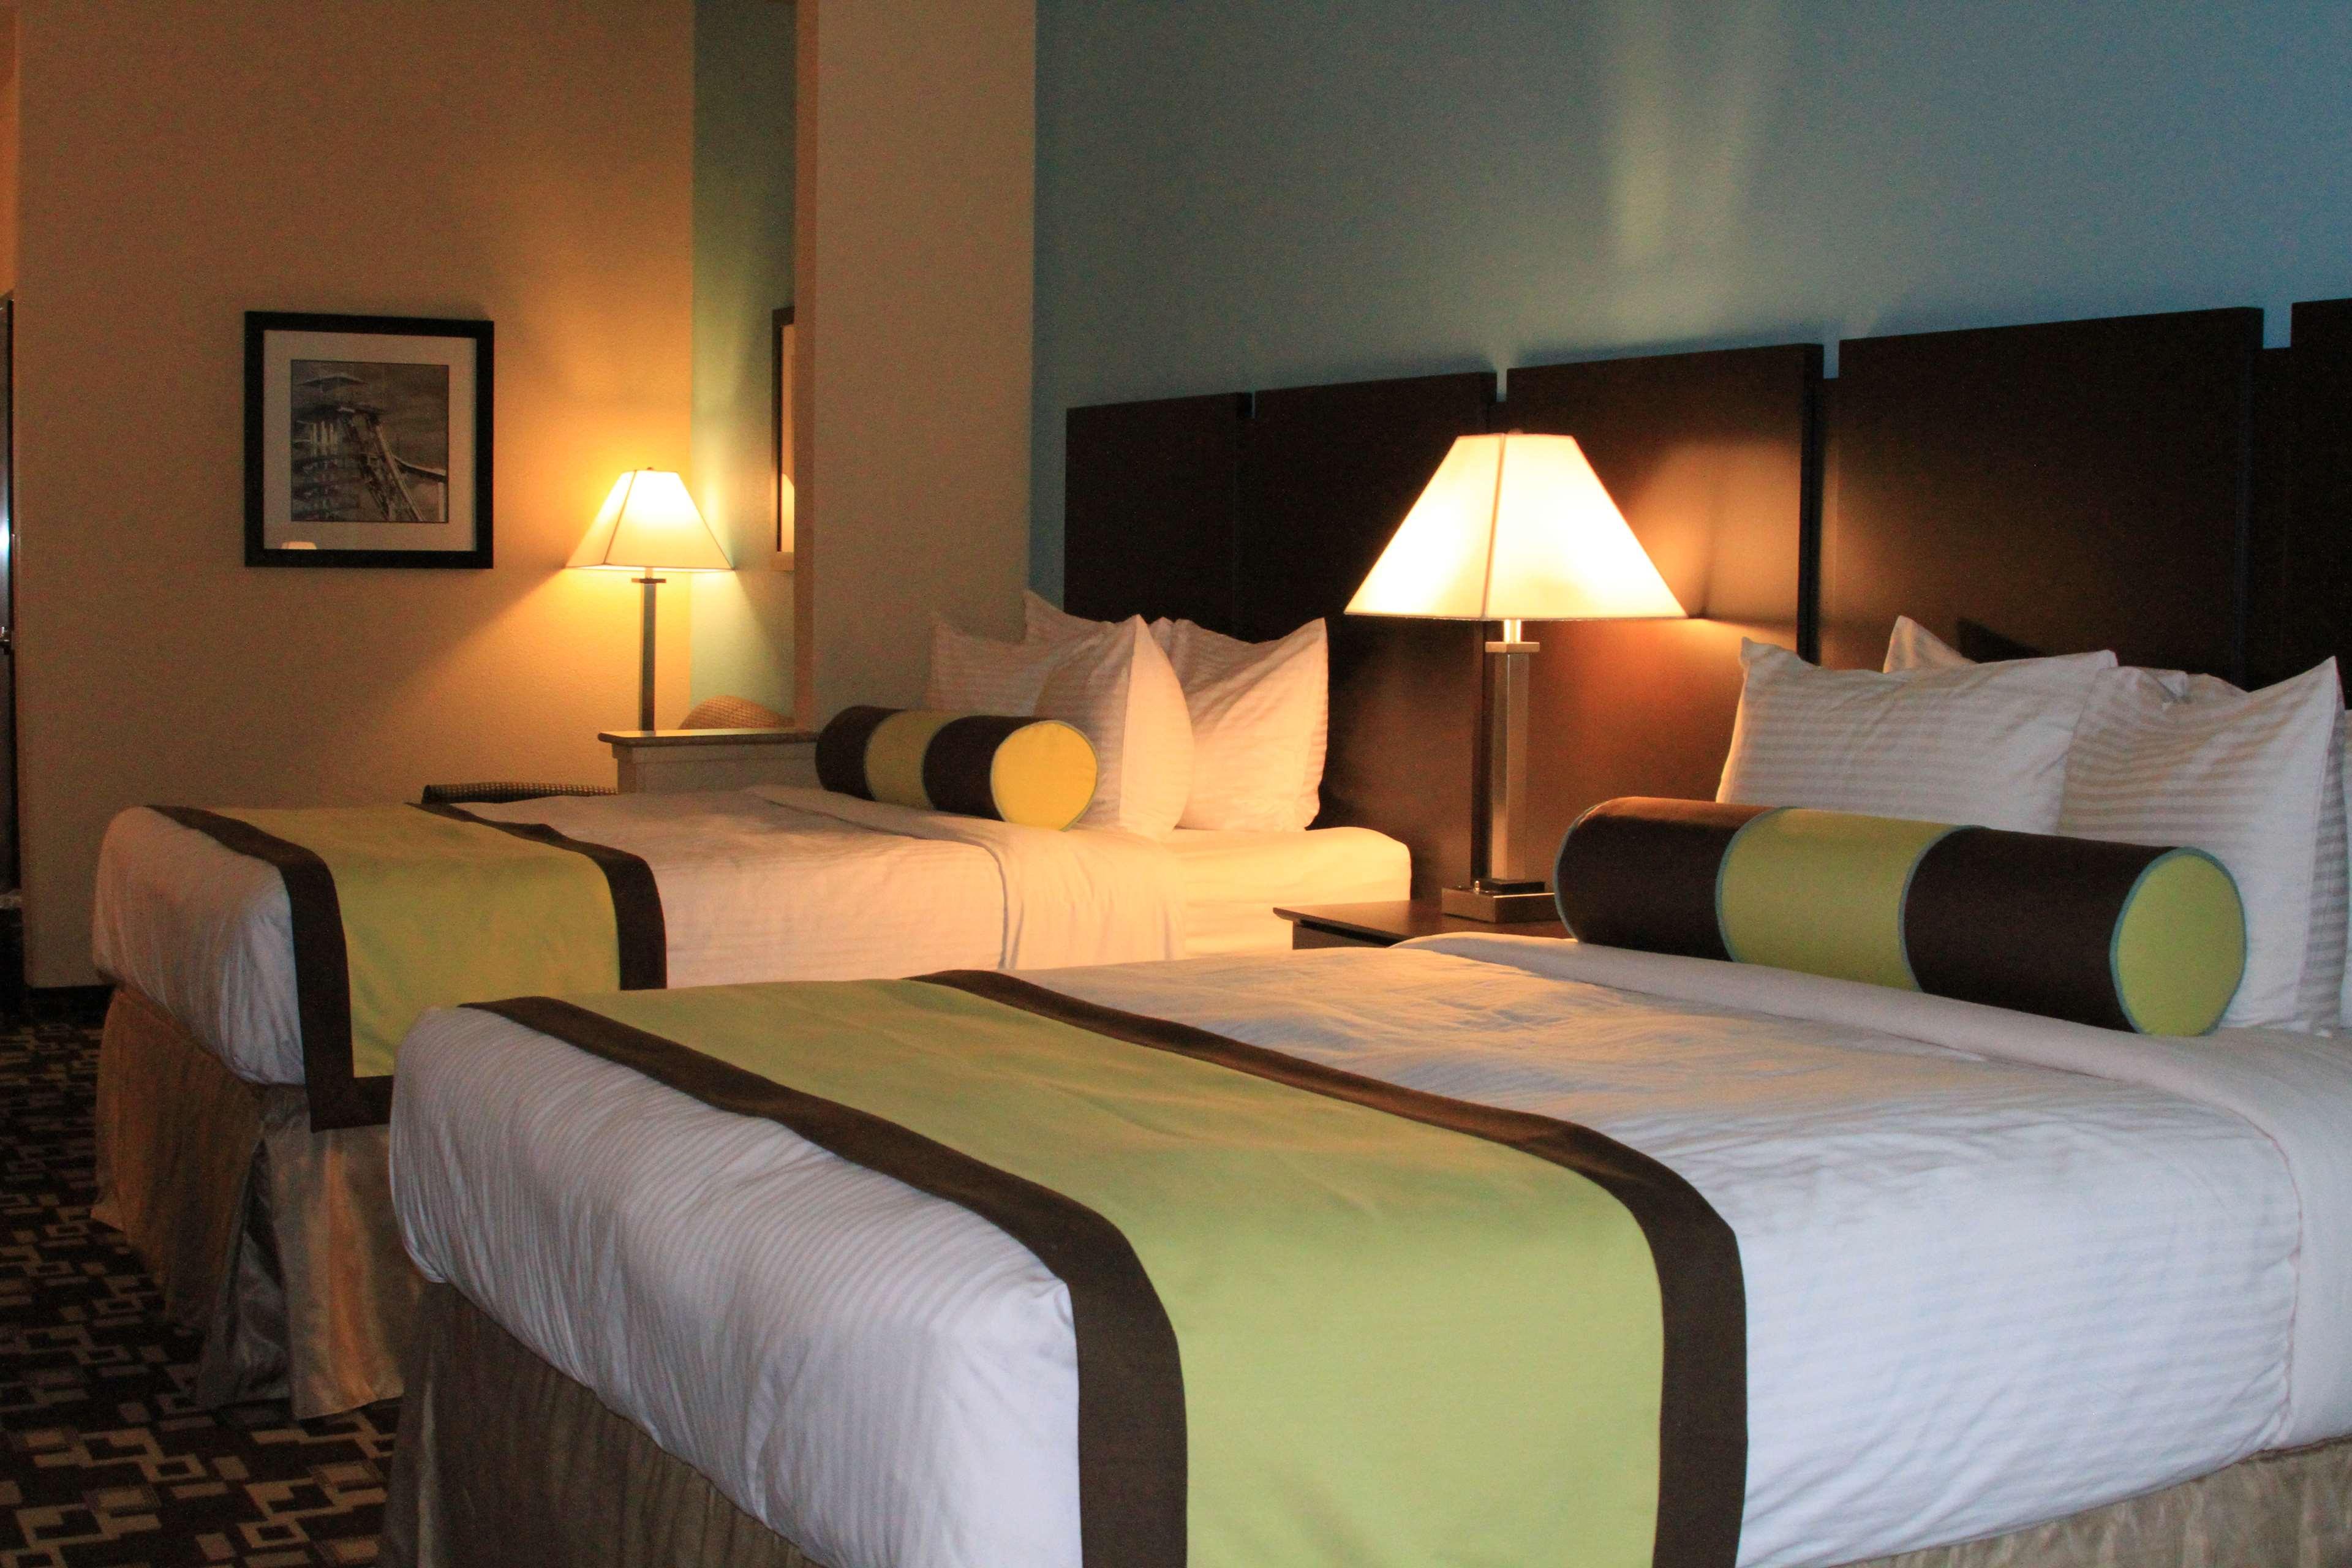 Best Western Plus Arlington North Hotel & Suites image 16